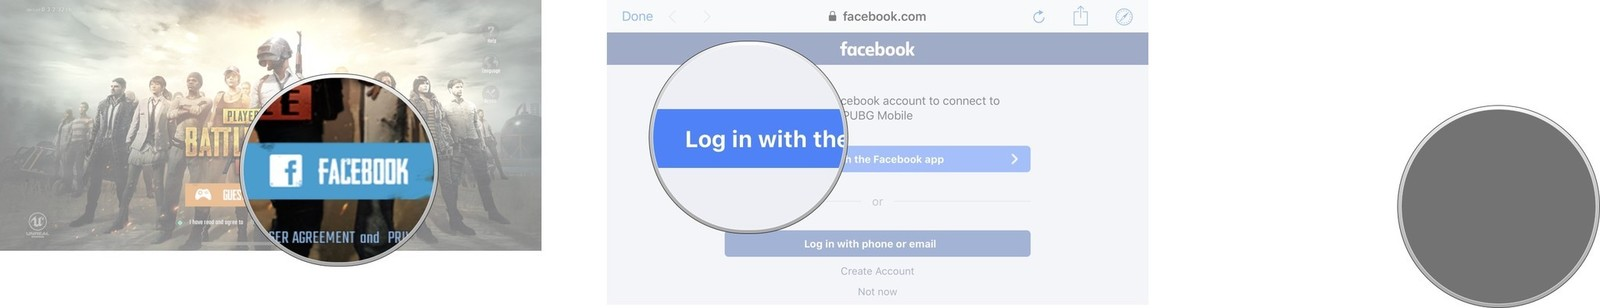 PUBG Mobile Facebook Mobile